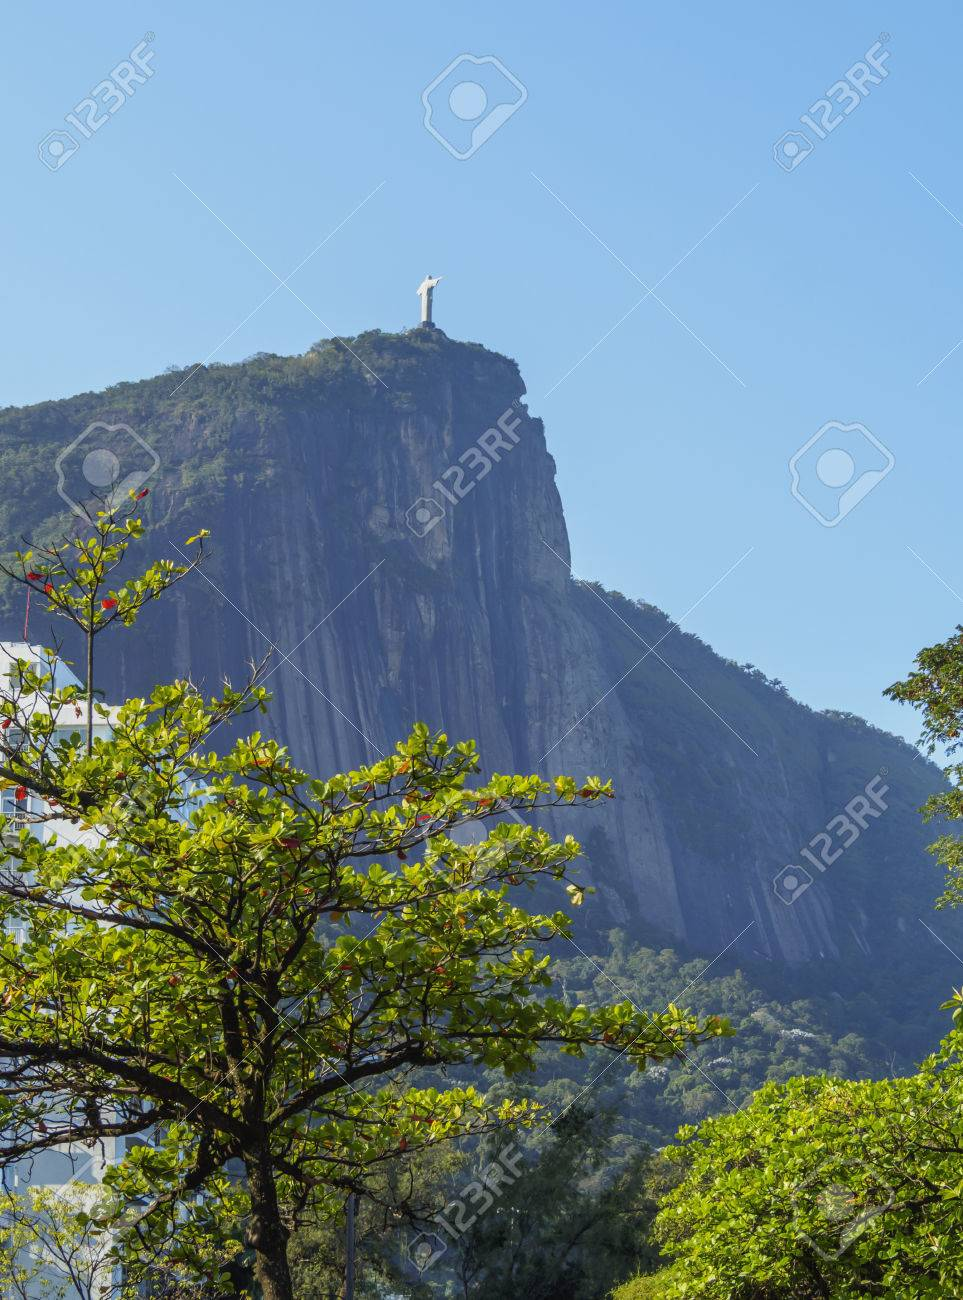 Brasilien Rio De Janeiro Zona Sul Corcovado Und Christus Statue